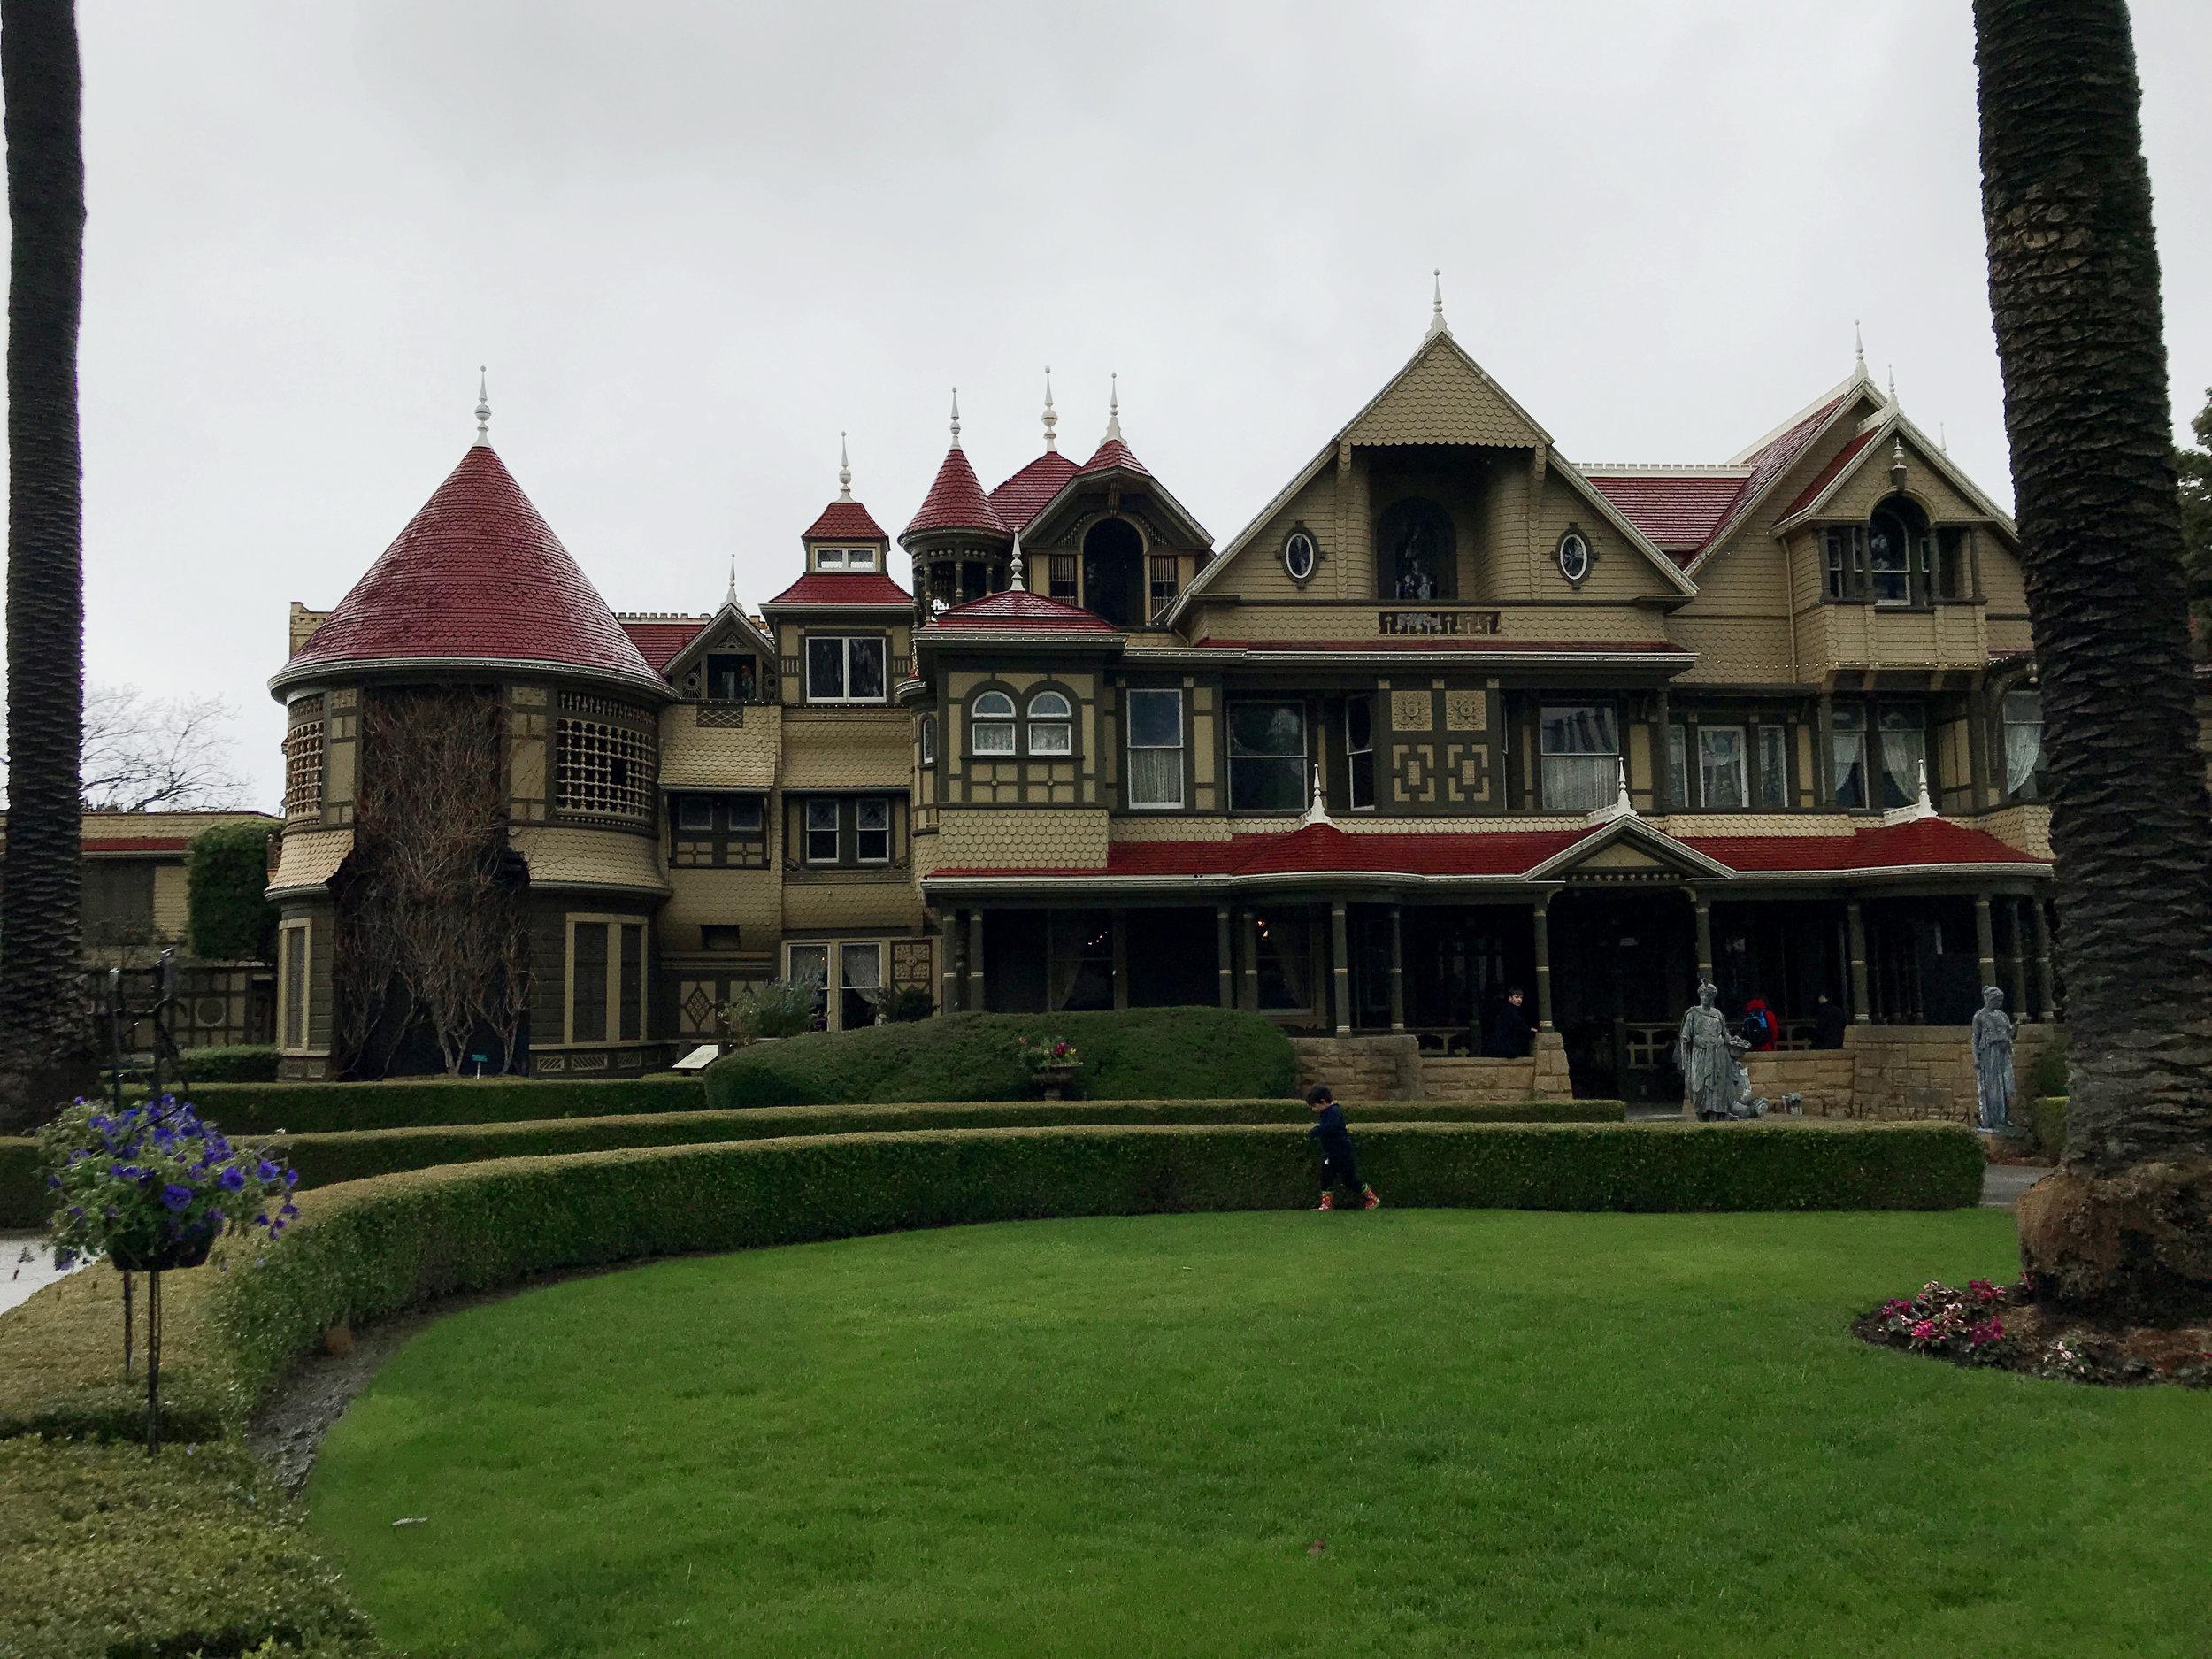 KAESPO San Jose Travel Blog Post - Visiting the Winchester Mystery House